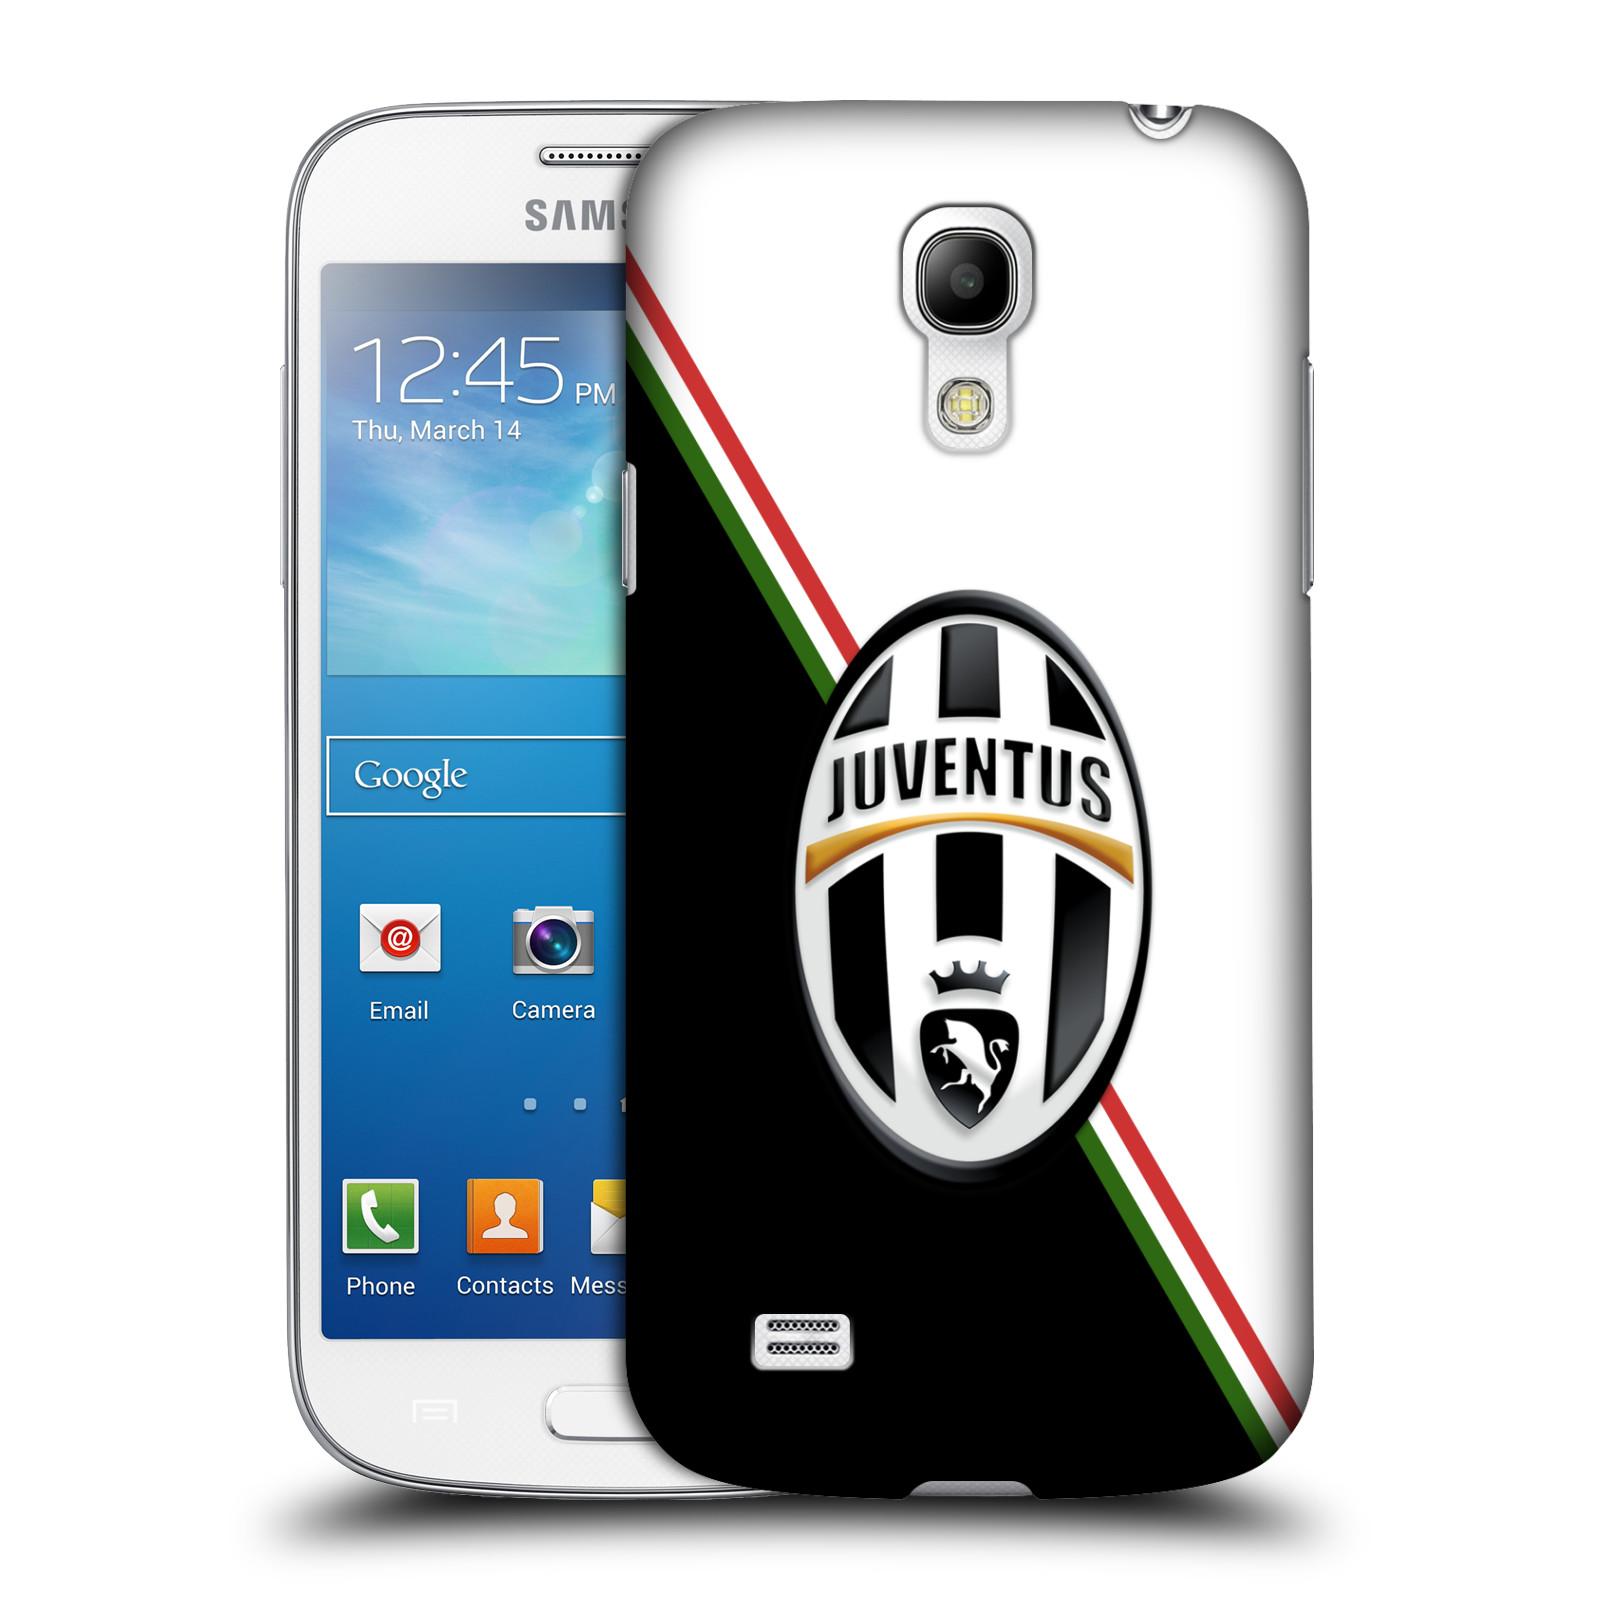 Plastové pouzdro na mobil Samsung Galaxy S4 Mini HEAD CASE Juventus FC - Black and White (Plastový kryt či obal na mobilní telefon Juventus FC Official pro Samsung Galaxy S4 Mini GT-i9195 / i9190)